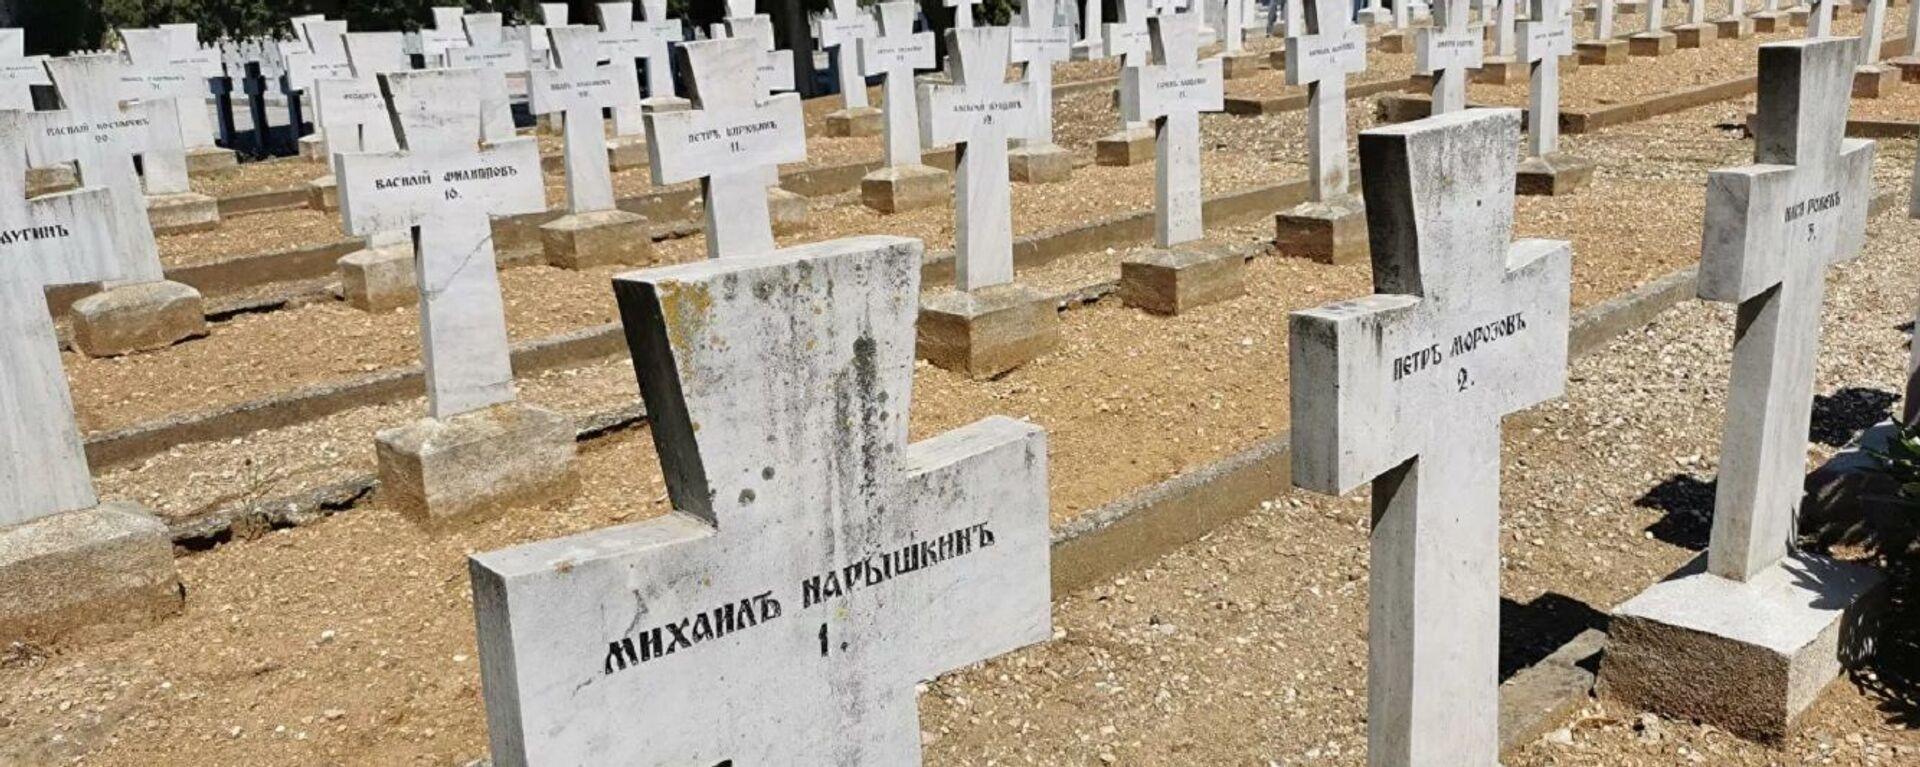 Војно гробље Зејтинлик - Sputnik Србија, 1920, 26.06.2021